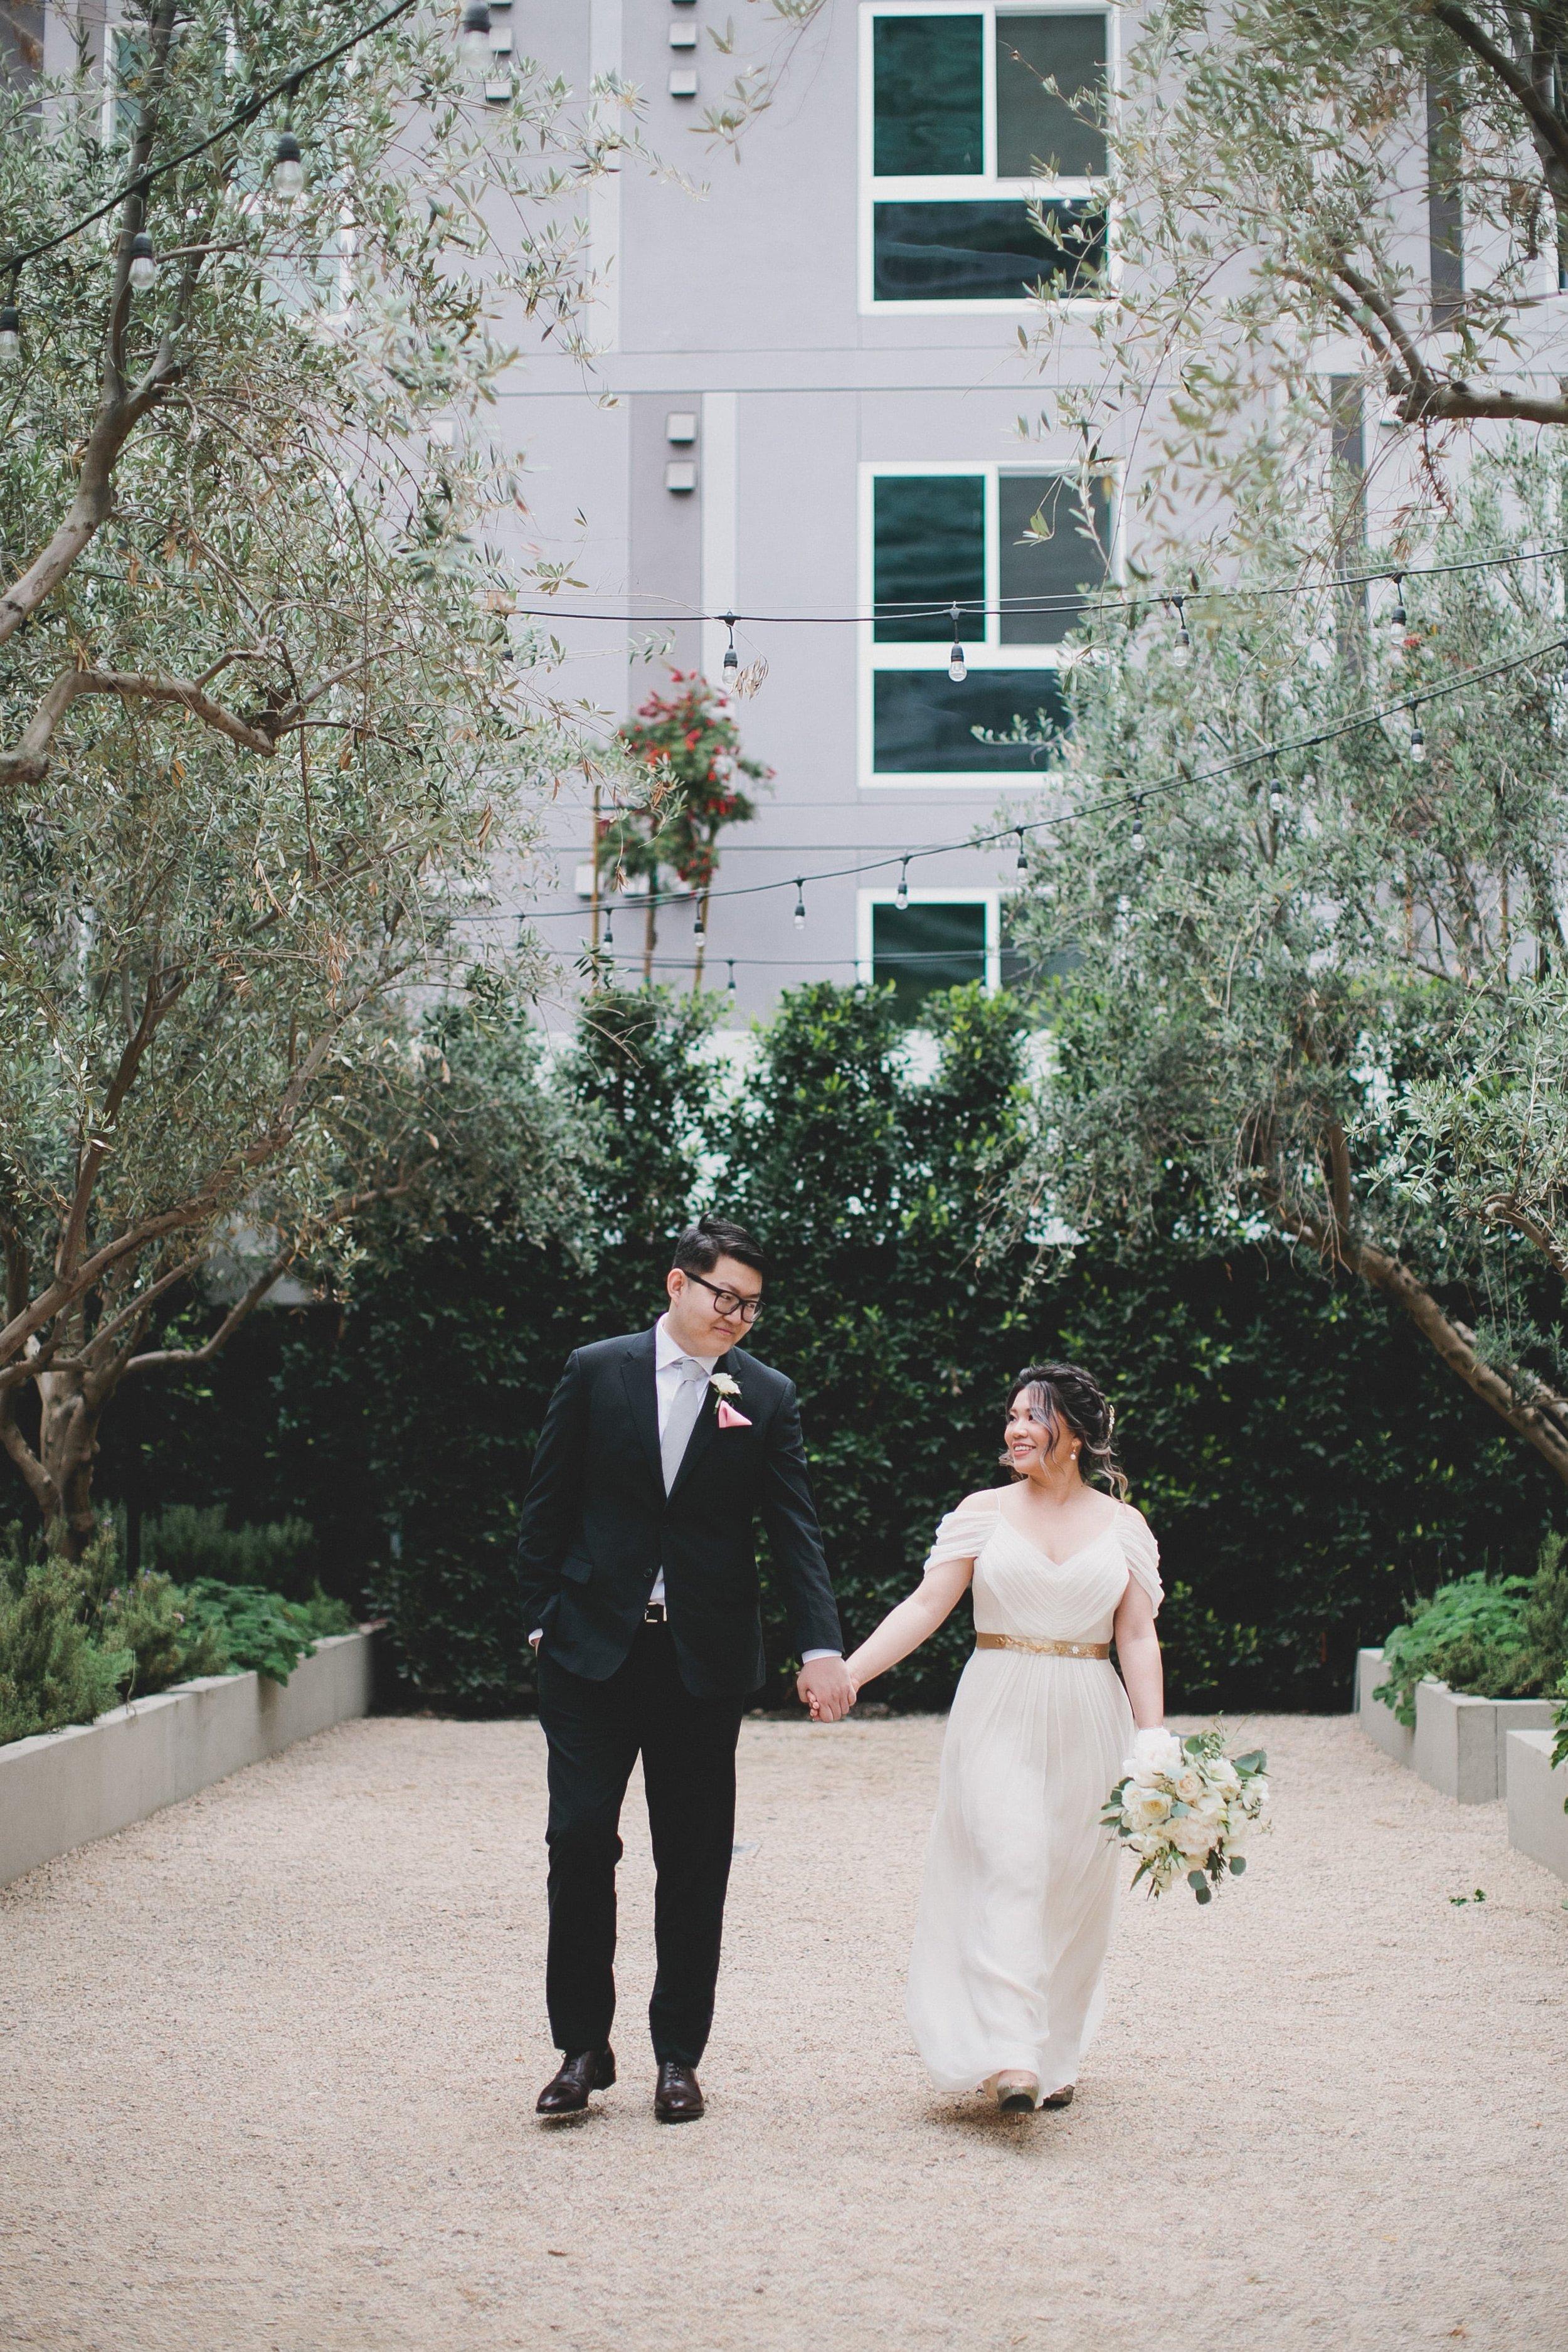 VeraMing_Wedding_KatiePritchard-30-min.jpg